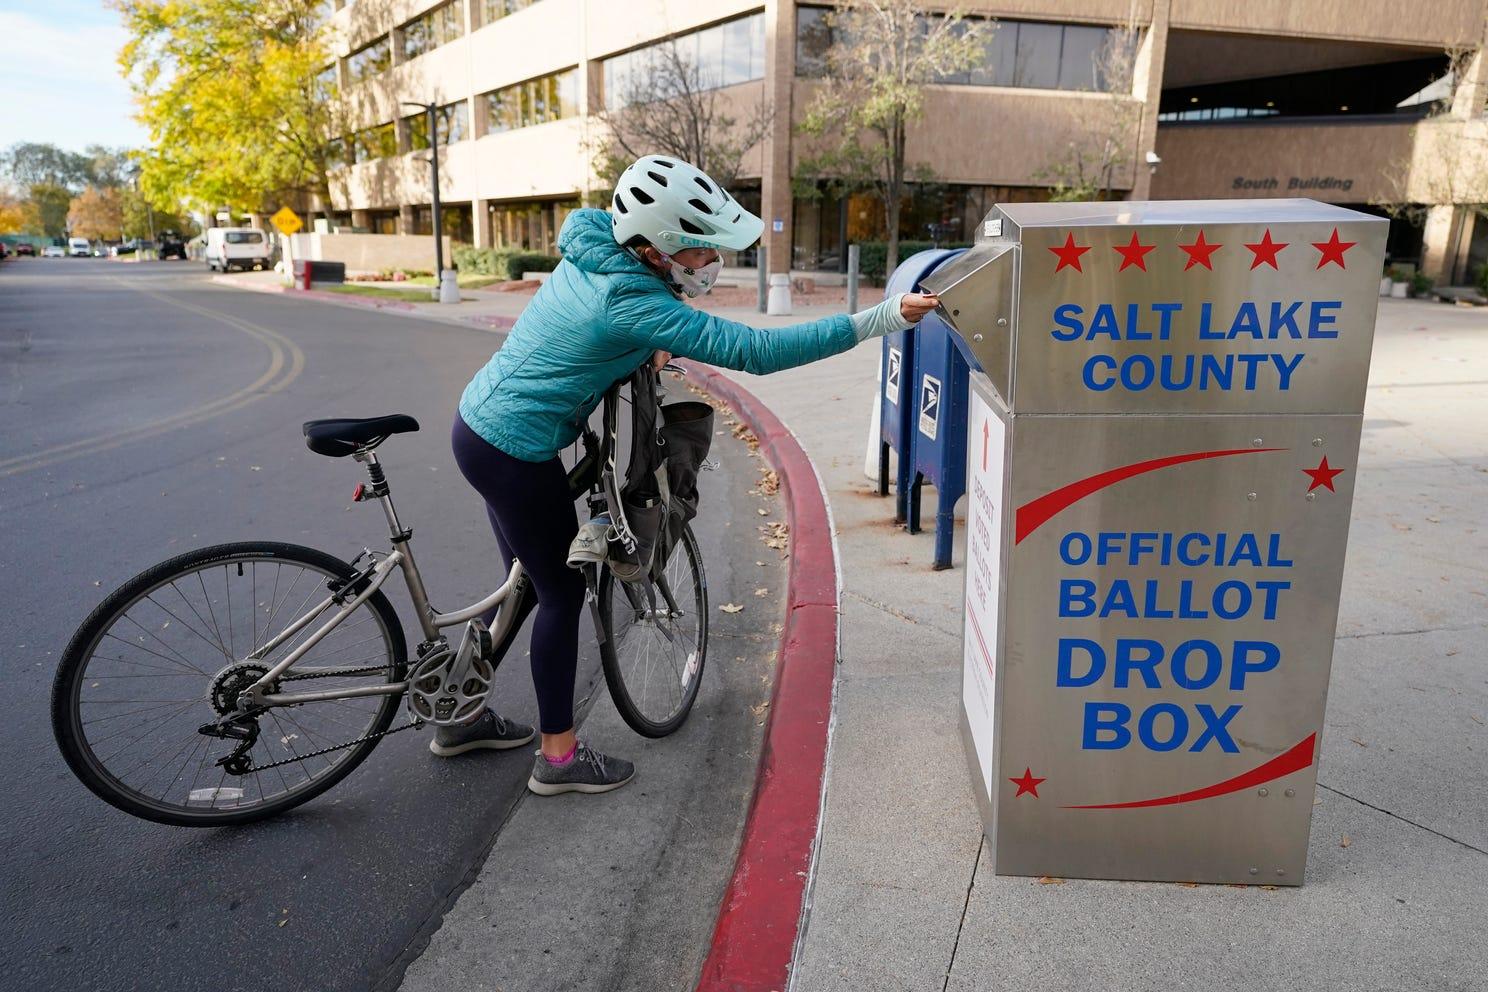 DROP BOX VOTING